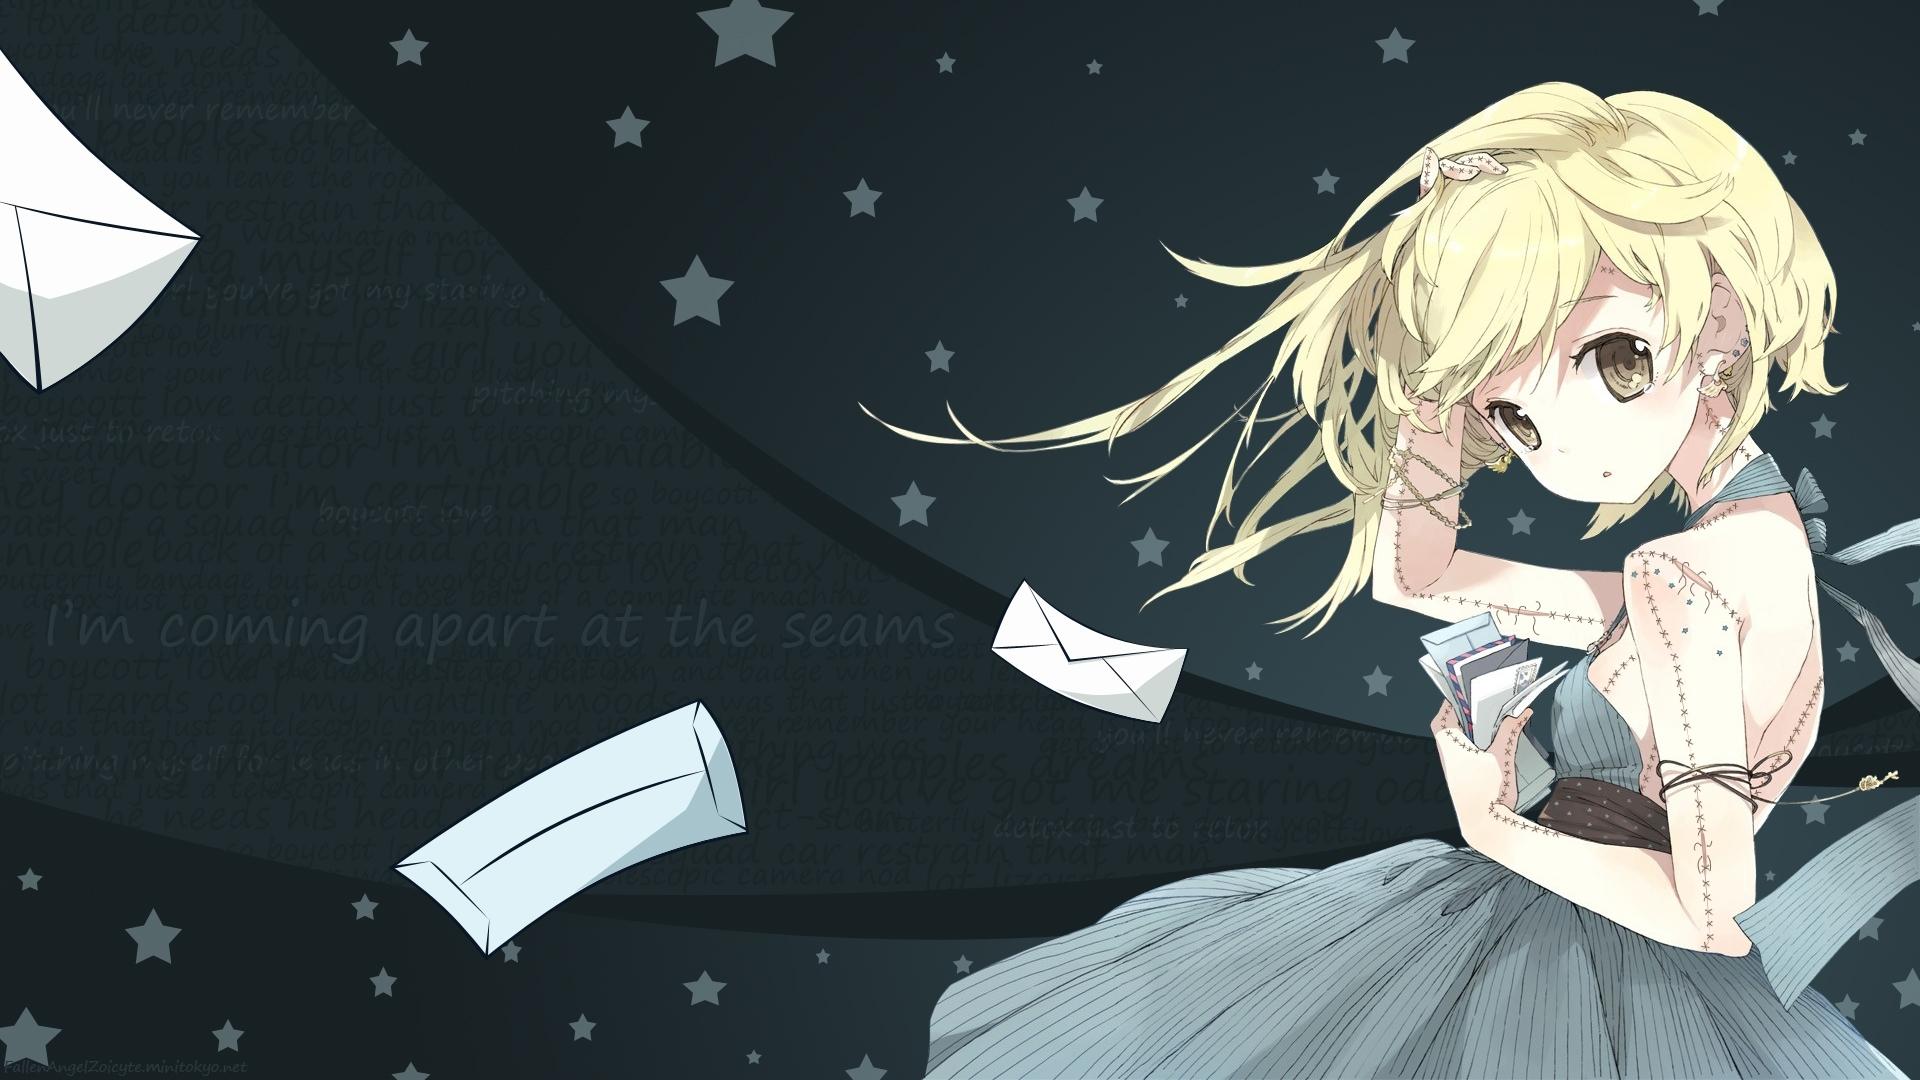 Illustration Anime Stars Dress Cartoon Writing Girl Piercings Screenshot Mangaka